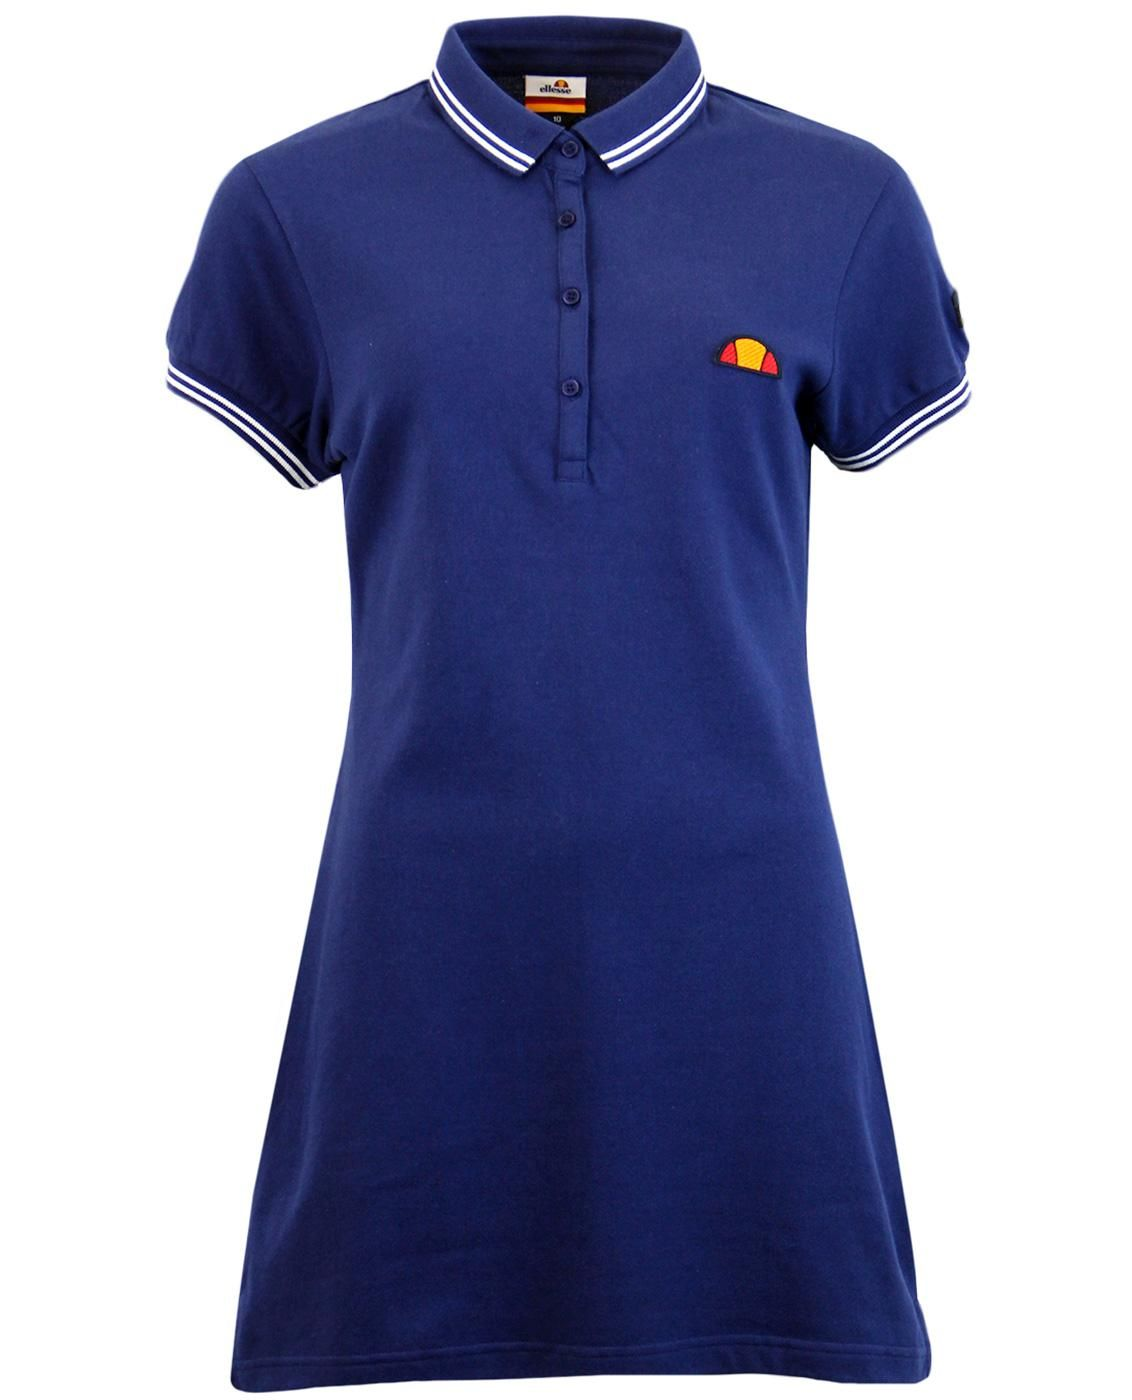 ea12c65de7243a Brand  Ellesse Womens. Key Points  Ellesse Womens Retro 80s pique polo dress  with contrast tipping